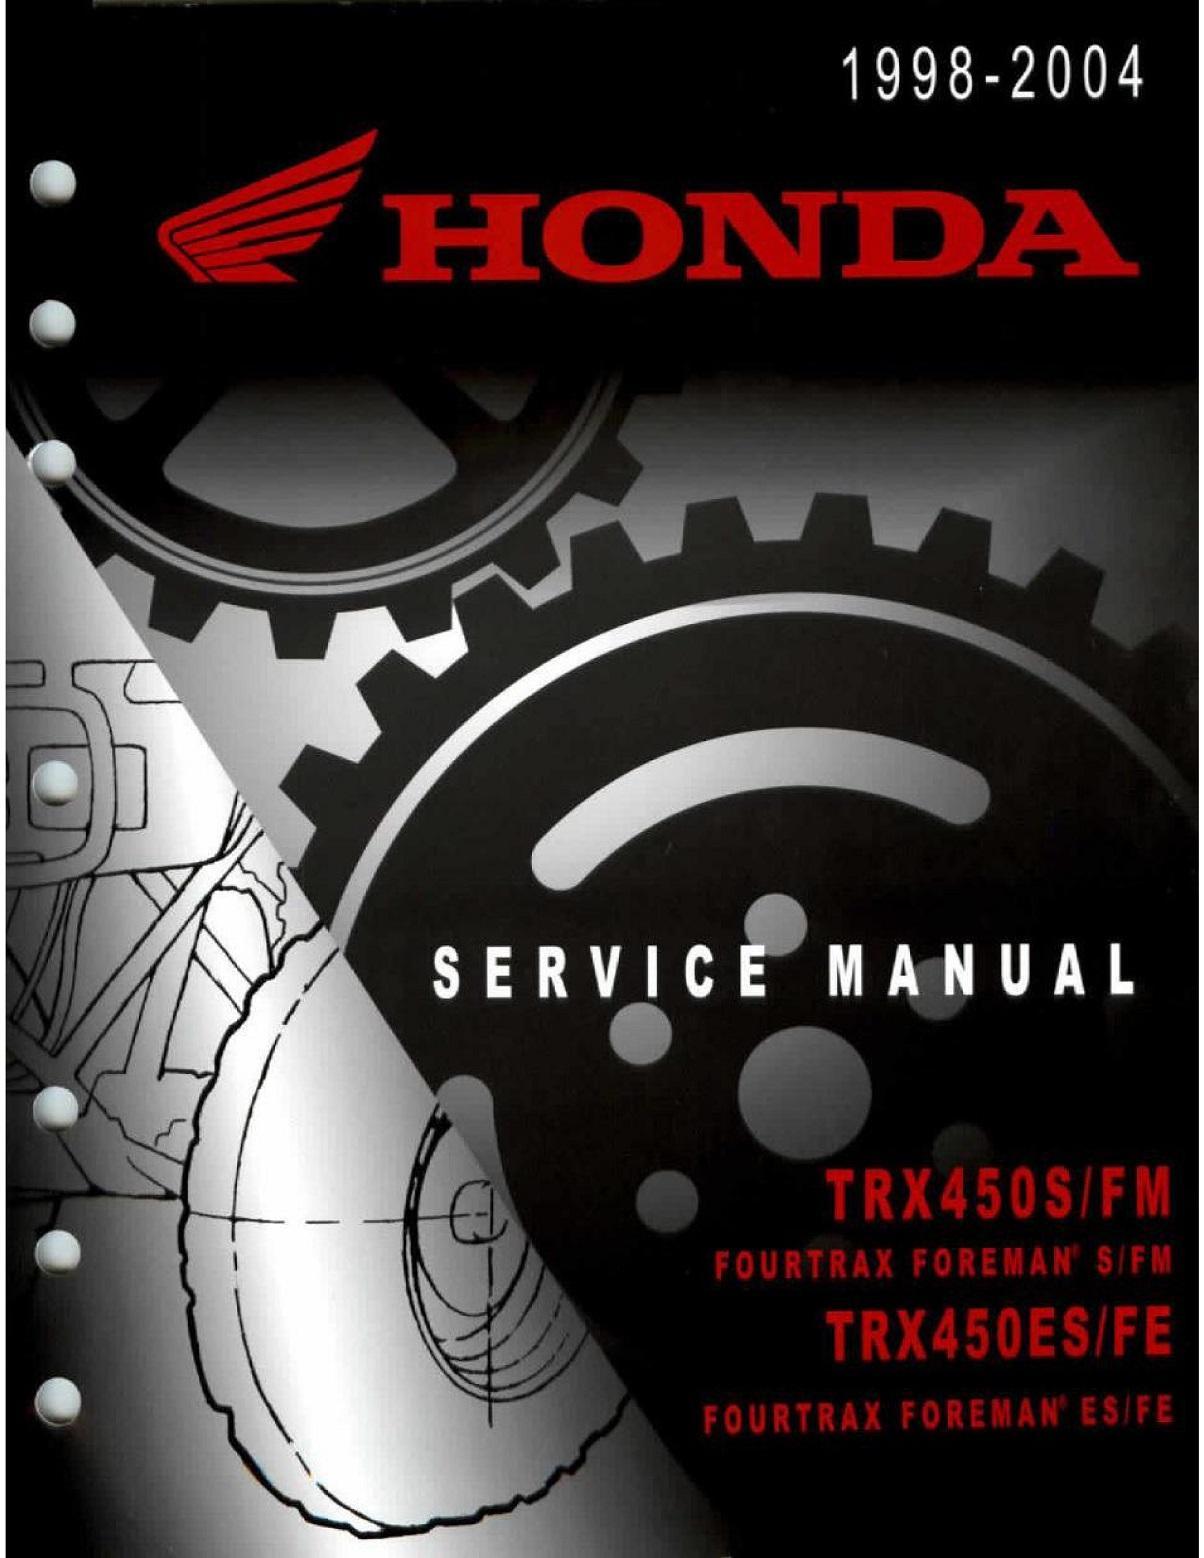 Workshop Manual for Honda TRX450FM (1998-2004)